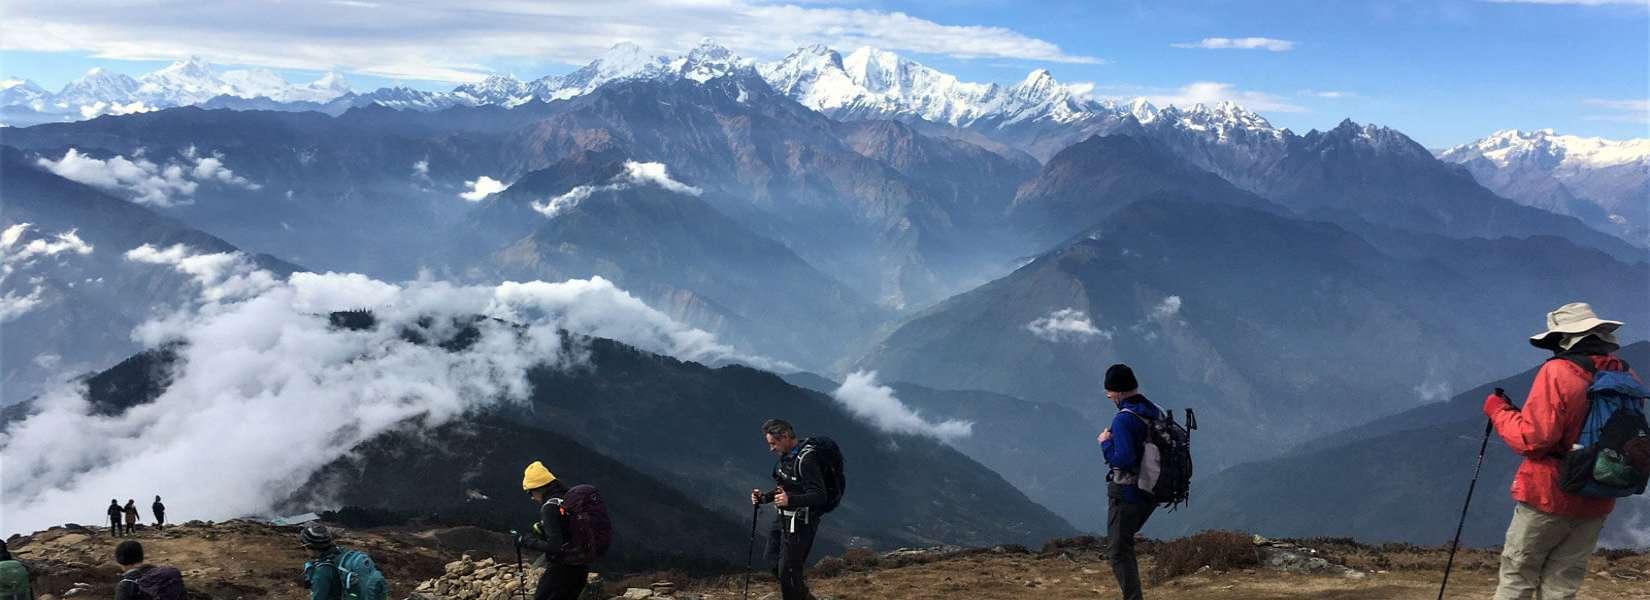 Trekking into the Region of Langtang Gosaikunda